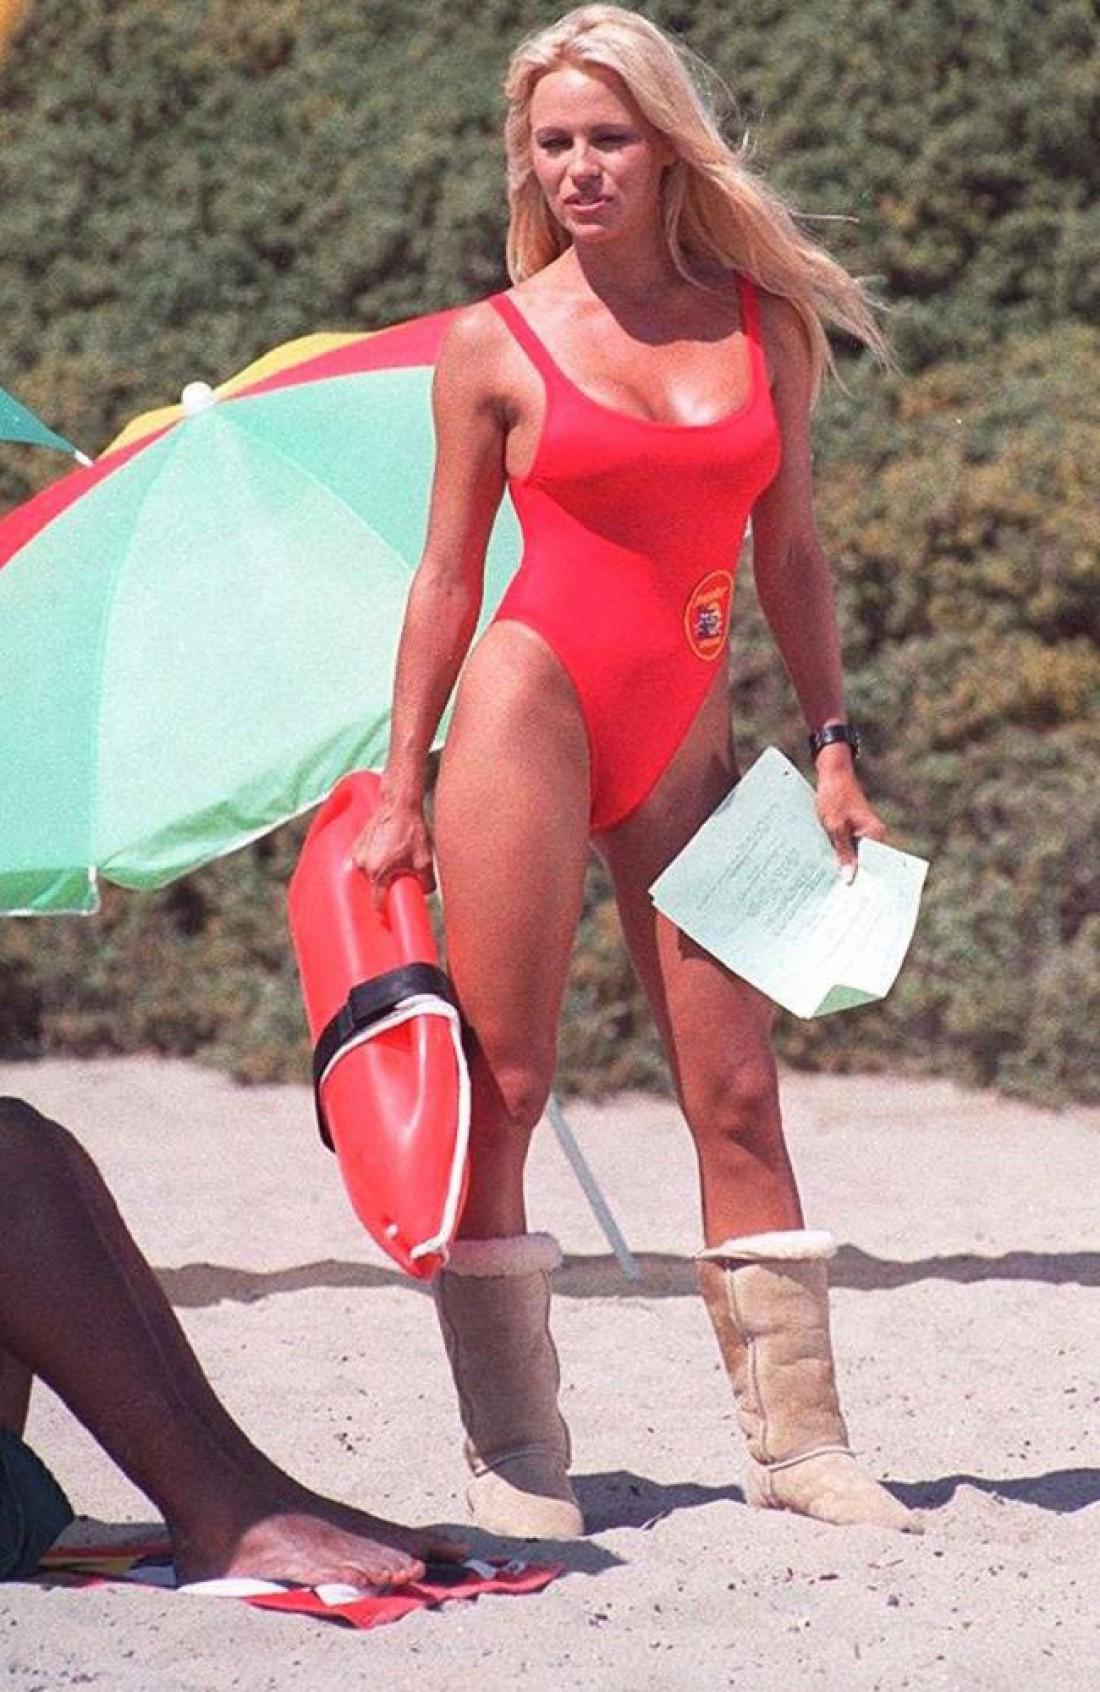 Памела Андерсон носила угги во время съемок сериала Спасатели Малибу